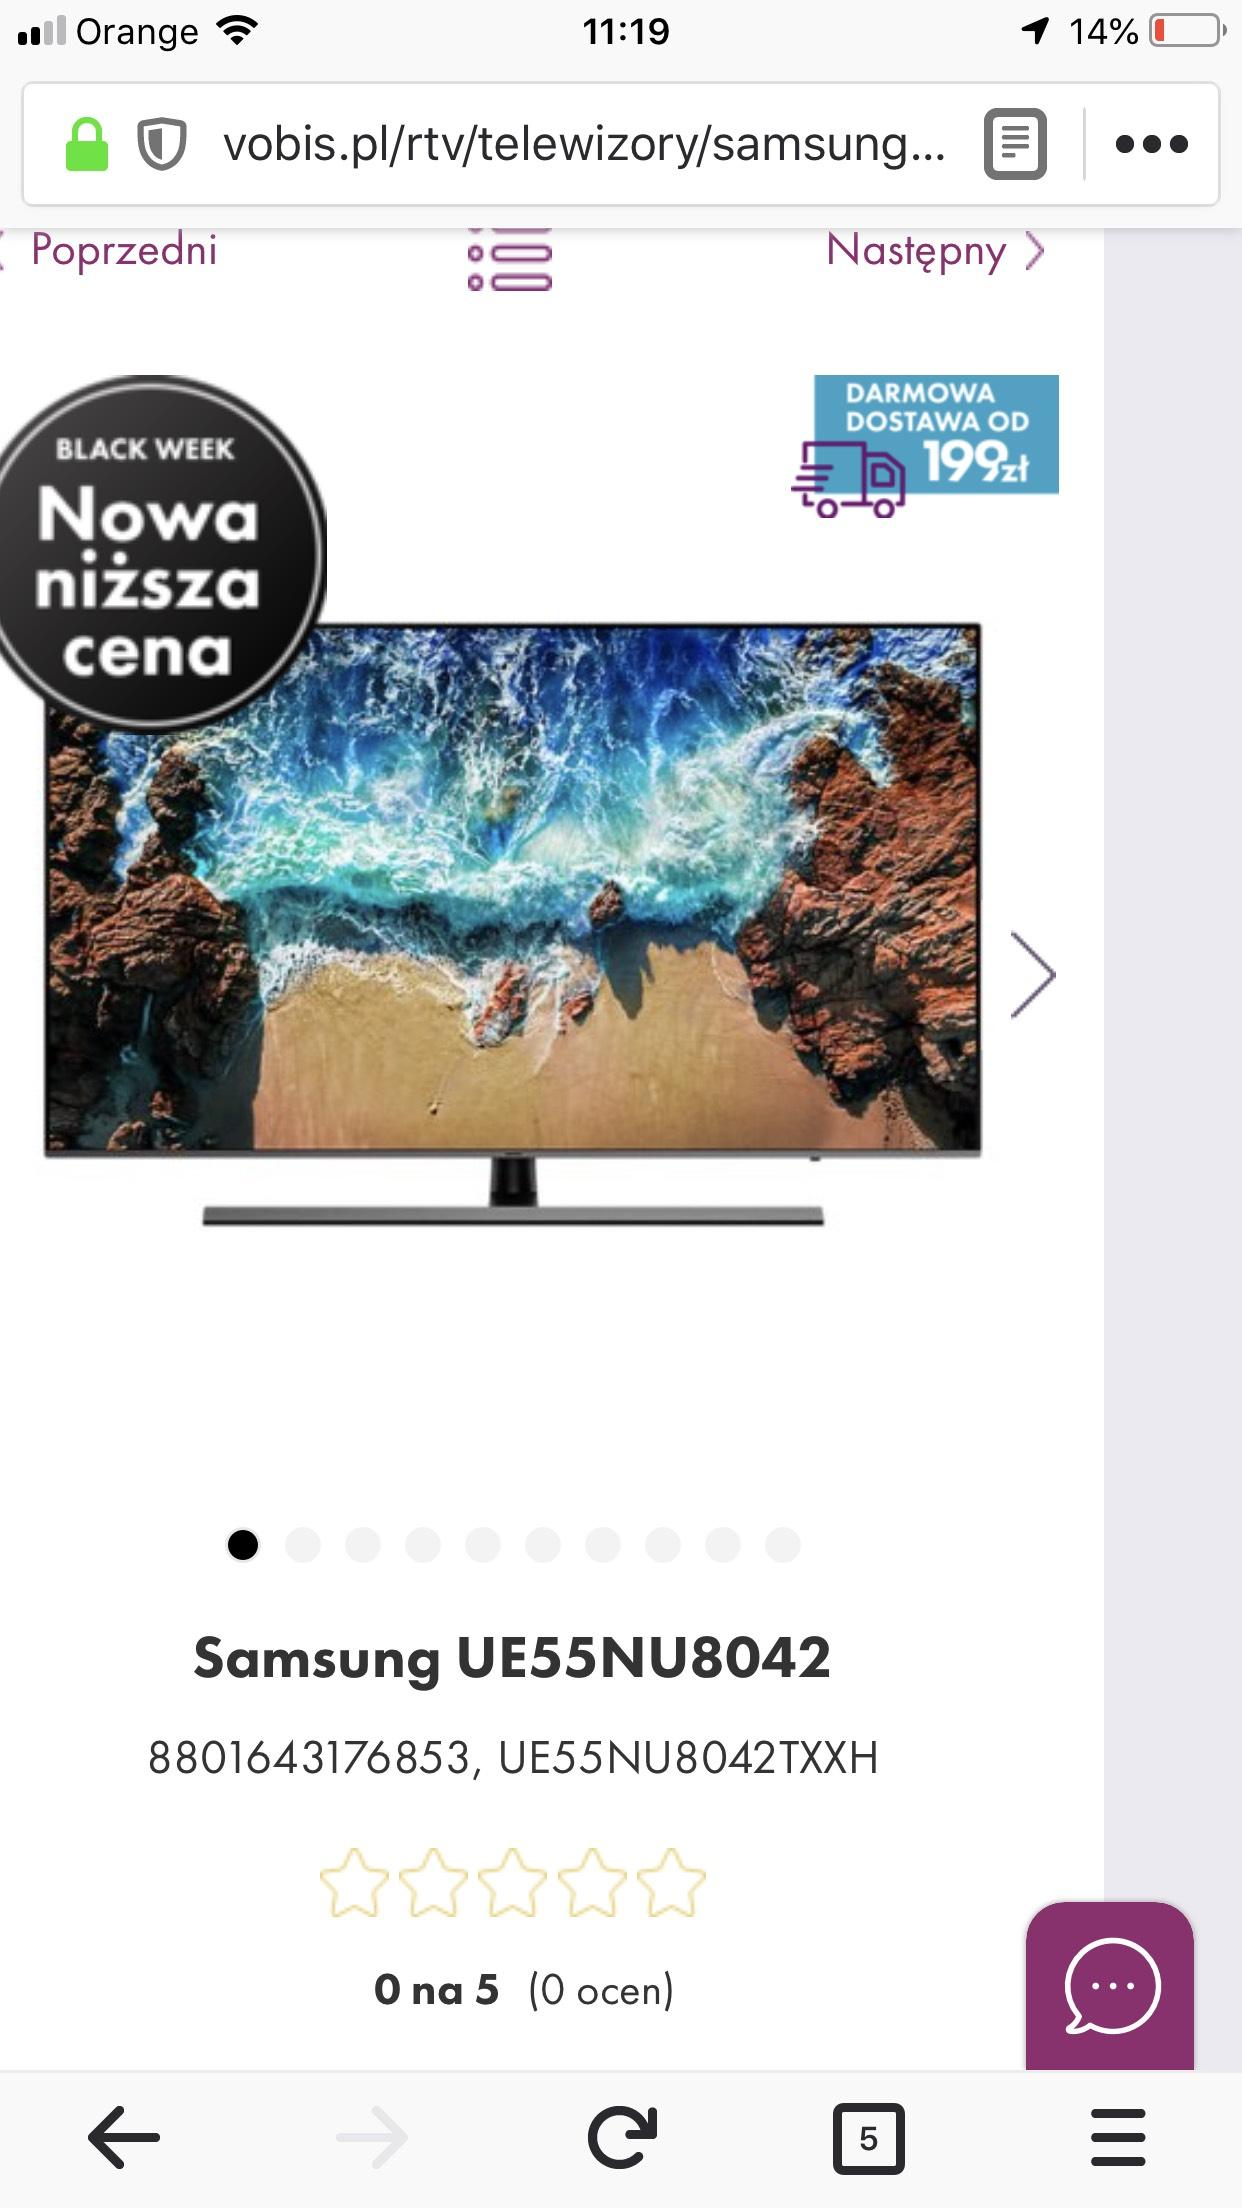 Samsung UE55NU8042